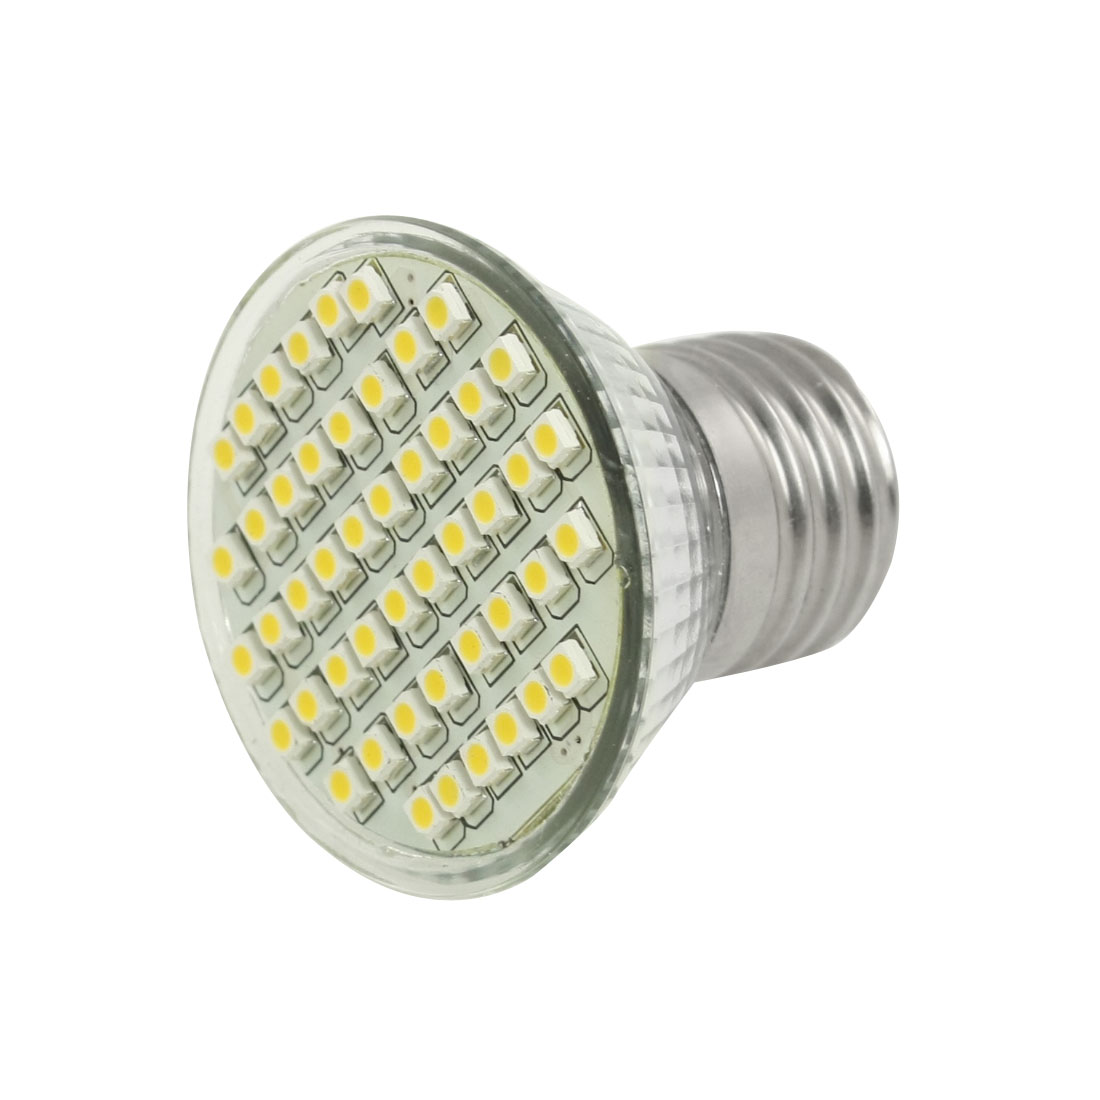 Energy Saving 48 SMD LED Warm White Lamp Bulb 2800K-3000K 360LM AC 220V 4W